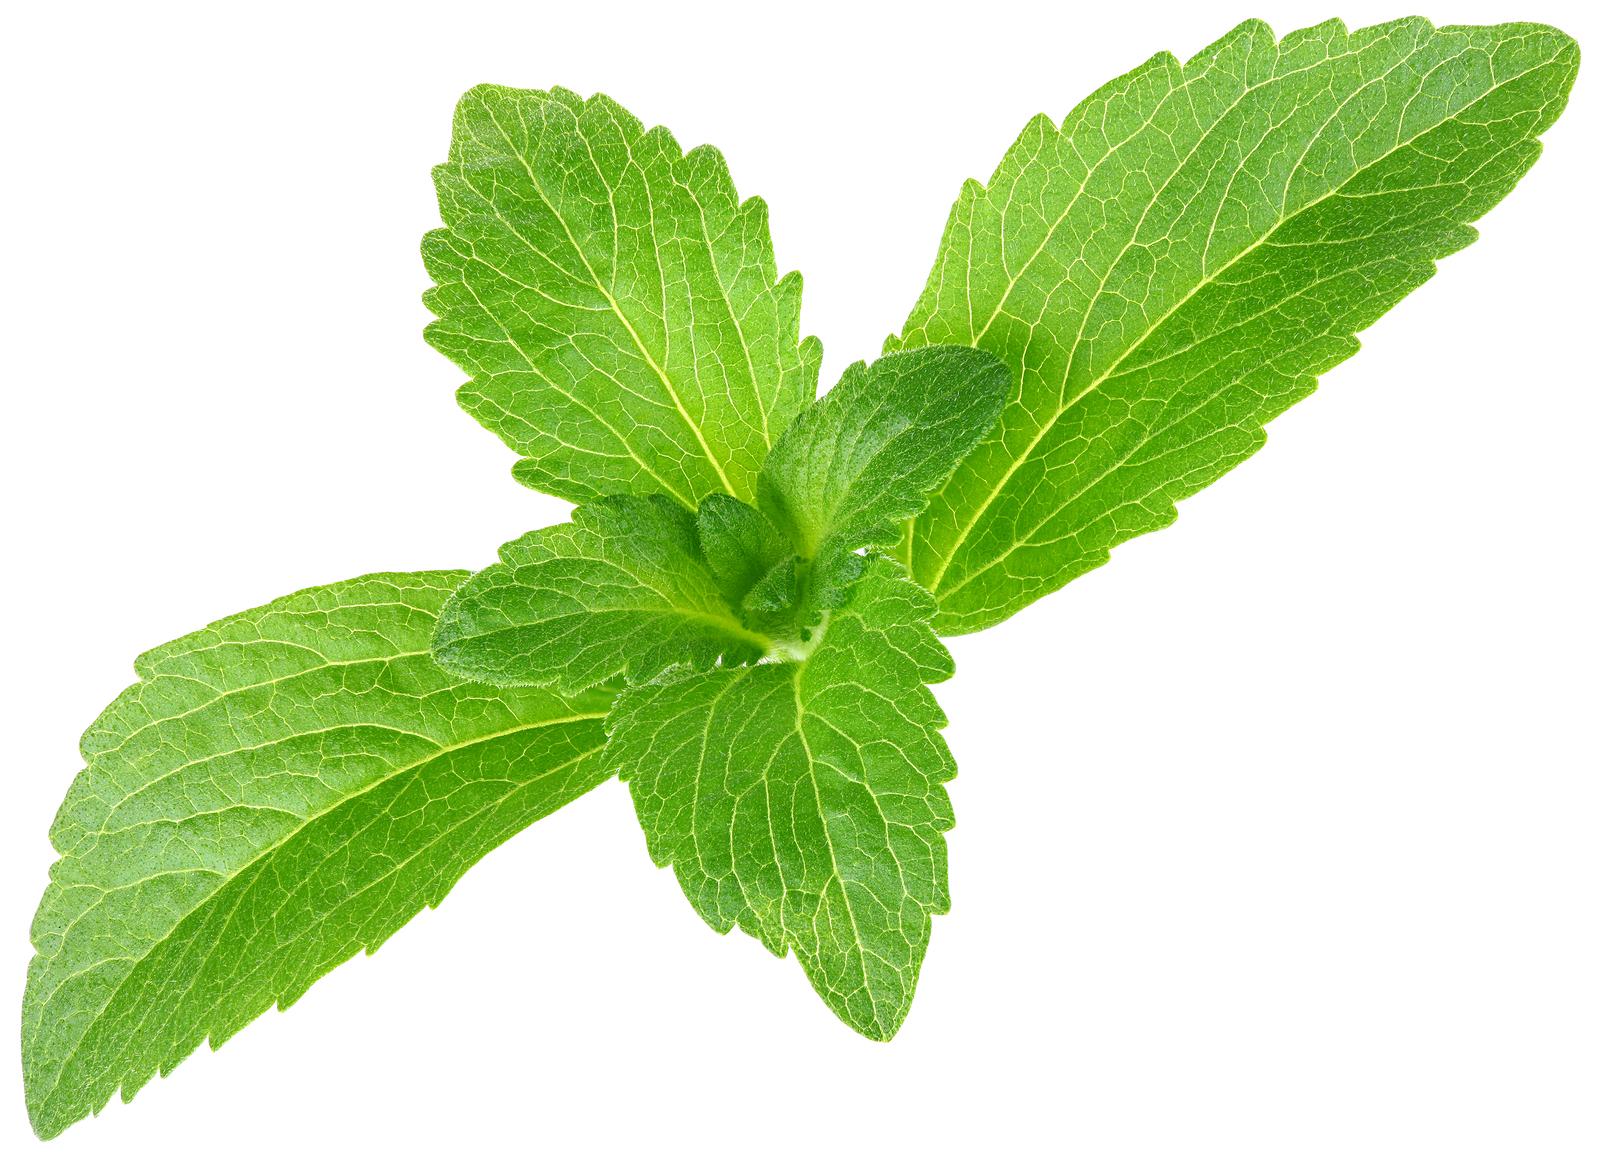 Gaseosas del mundo se rinden a la stevia, la hierba dulce de Paraguay